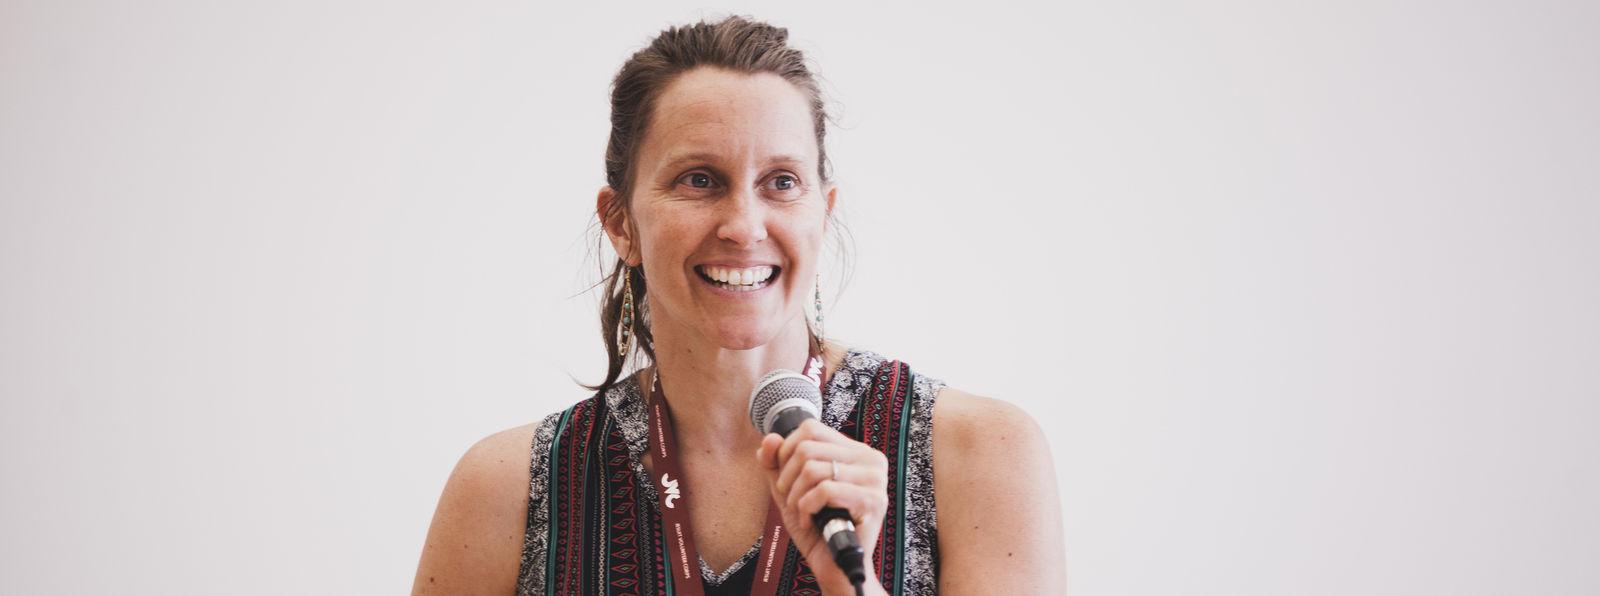 Paige Katzfey (Micronesia 2011-2013) at JVC Orientation. (2018)